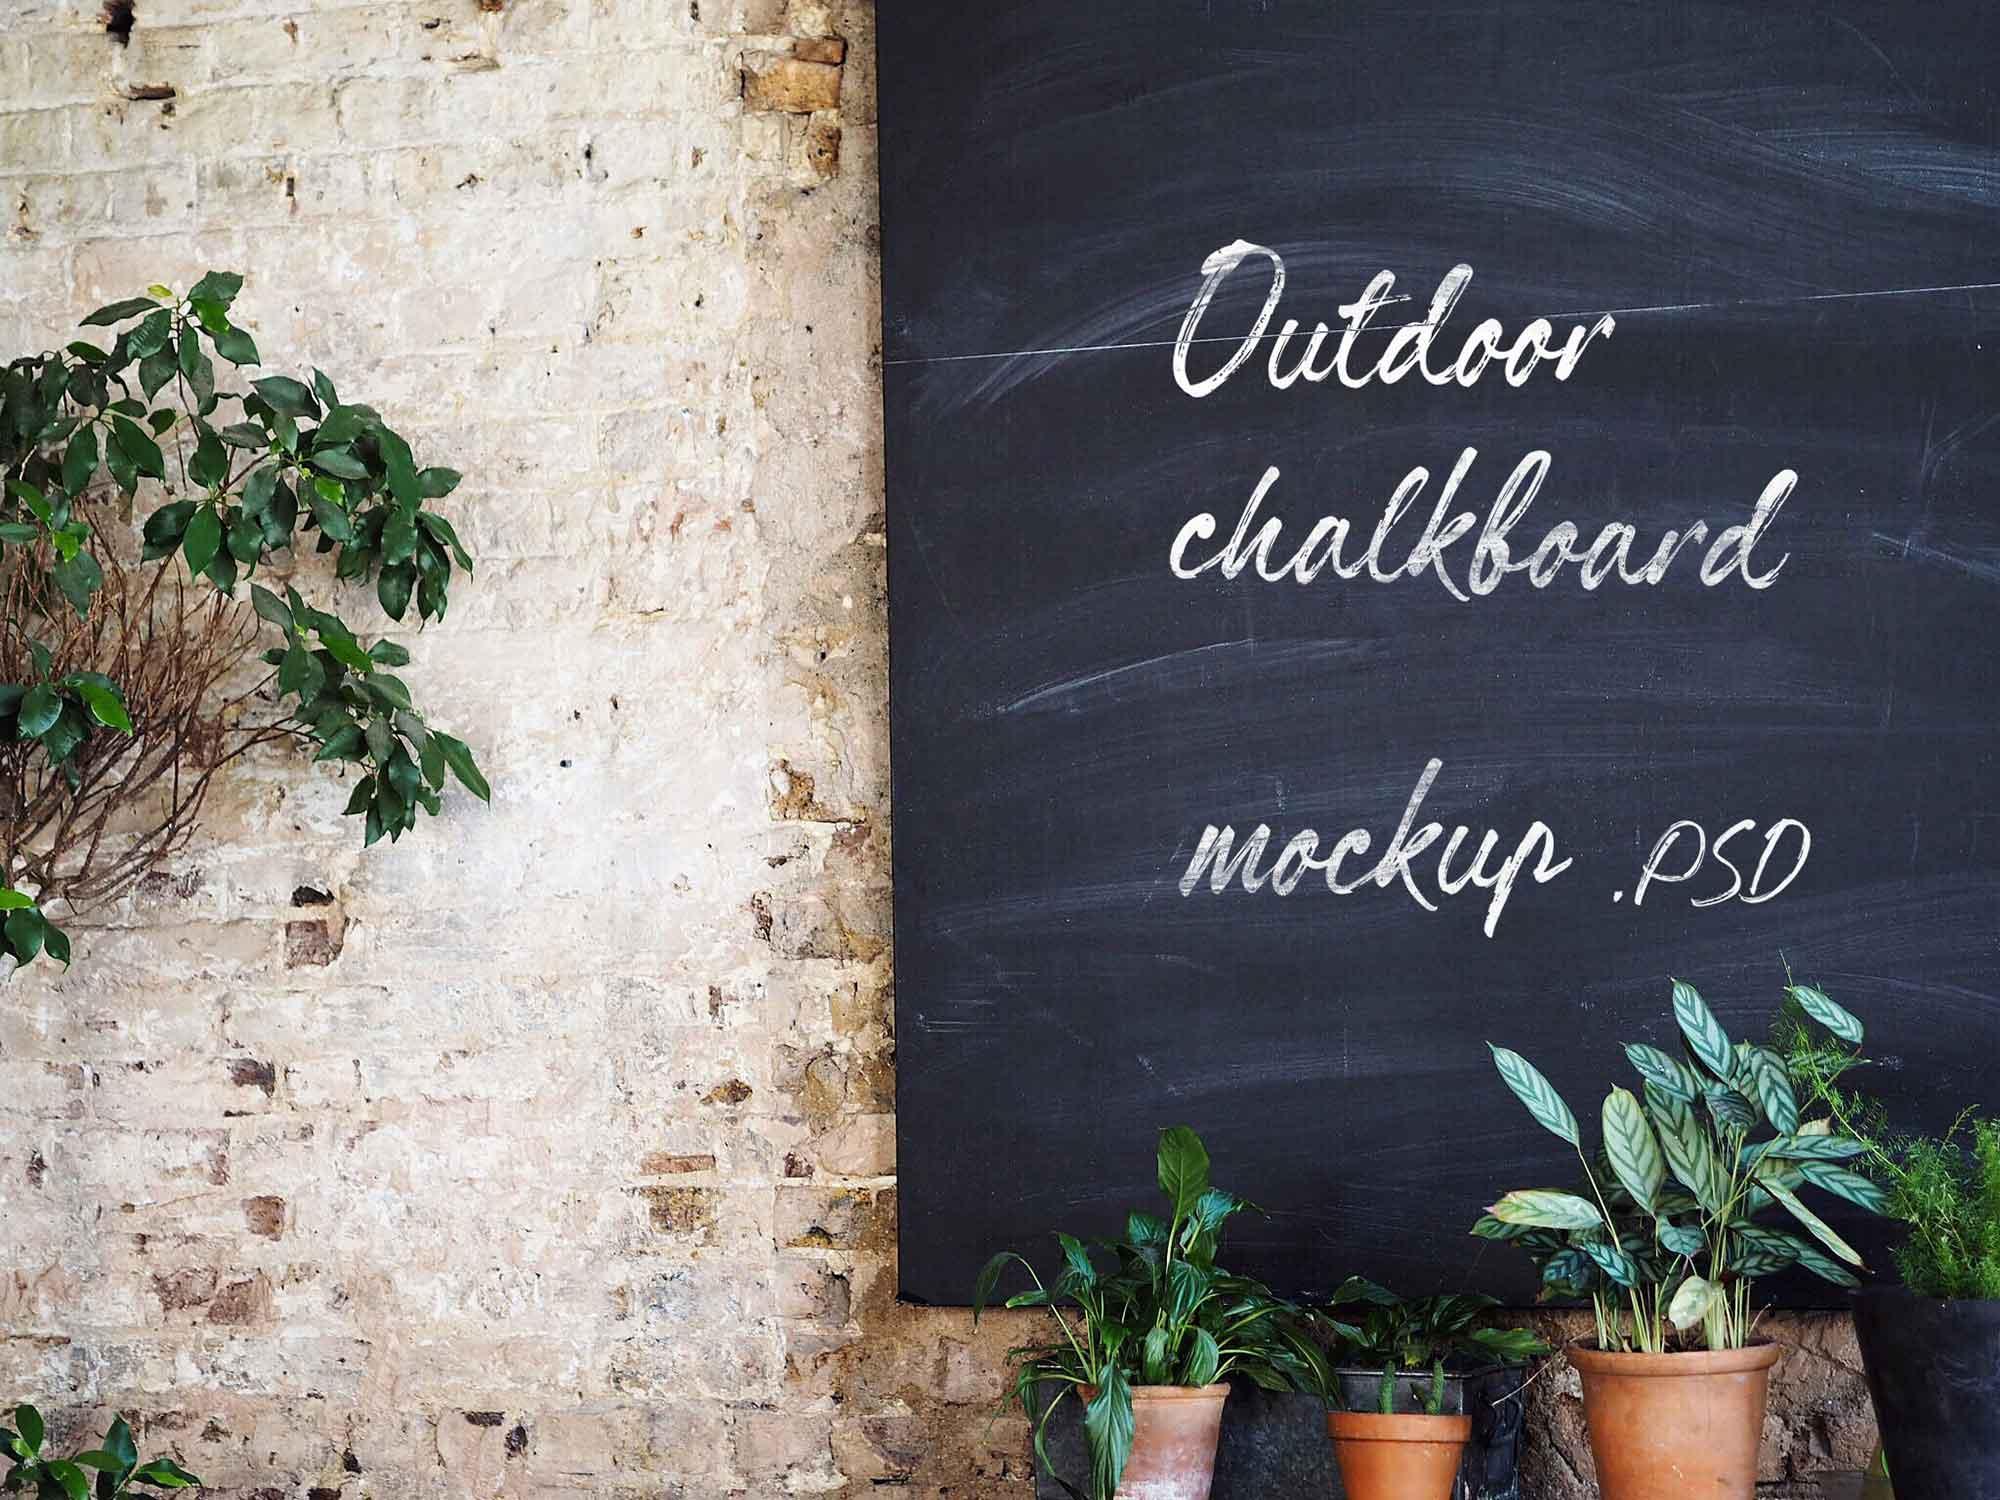 Outdoor Chalkboard Mockup